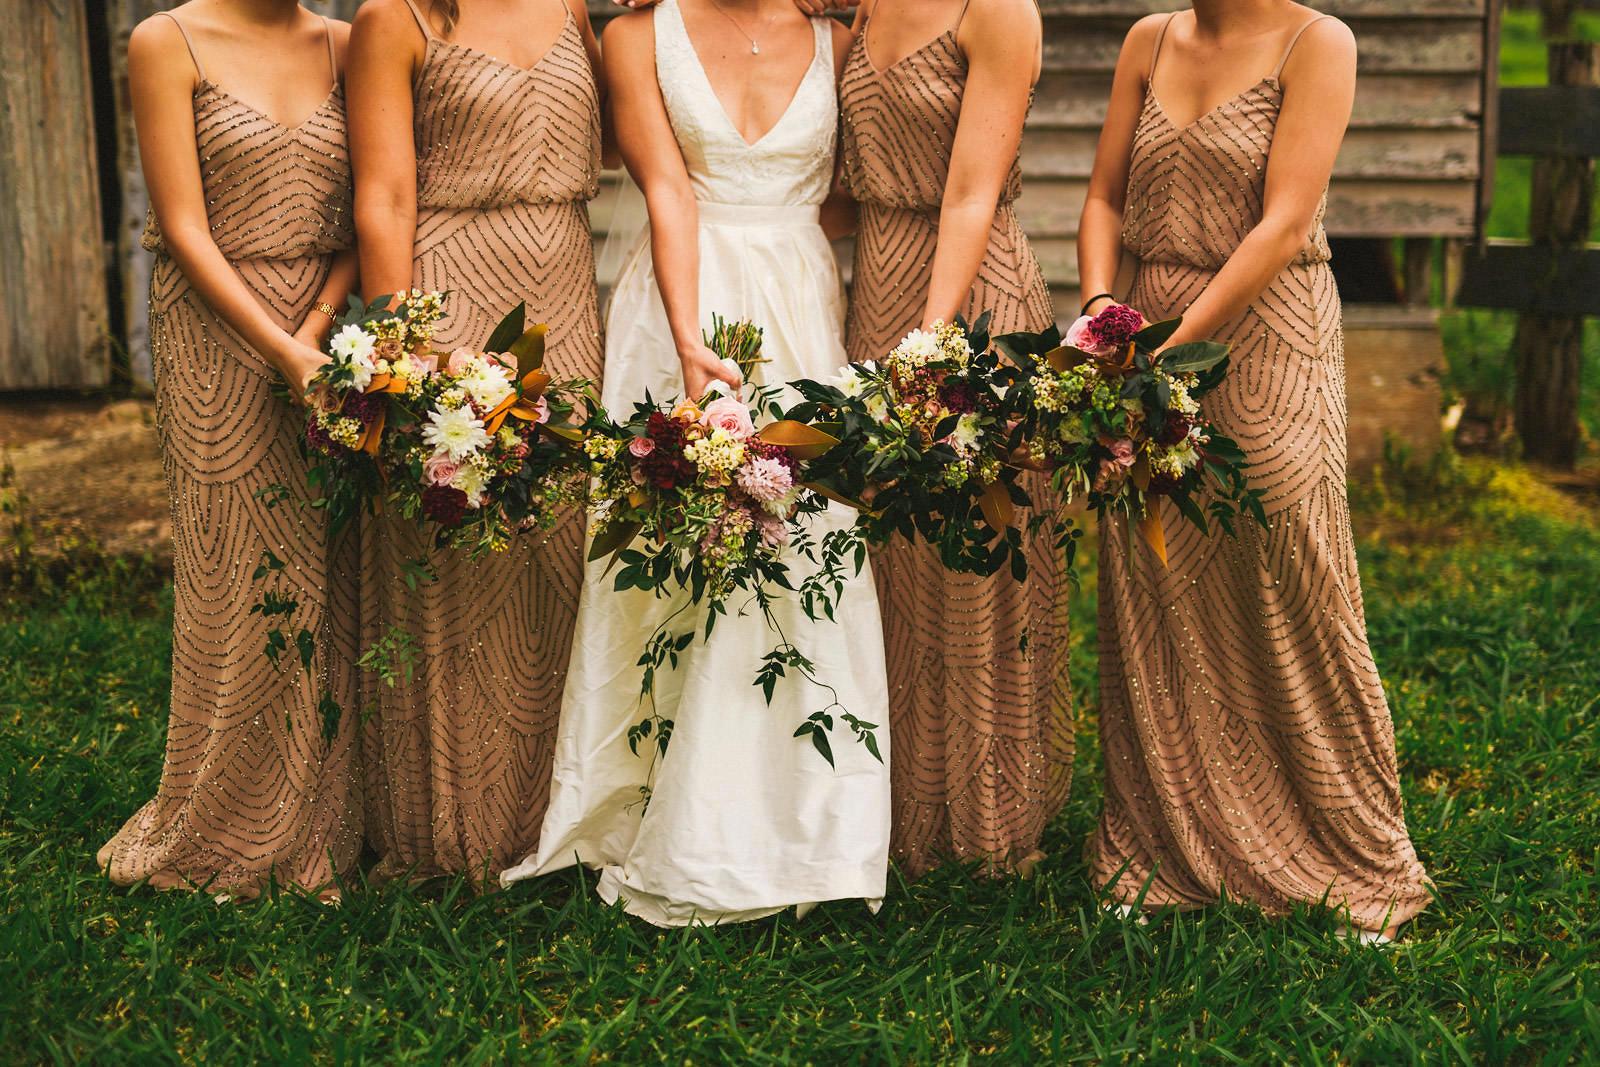 tablelands_wedding_0032